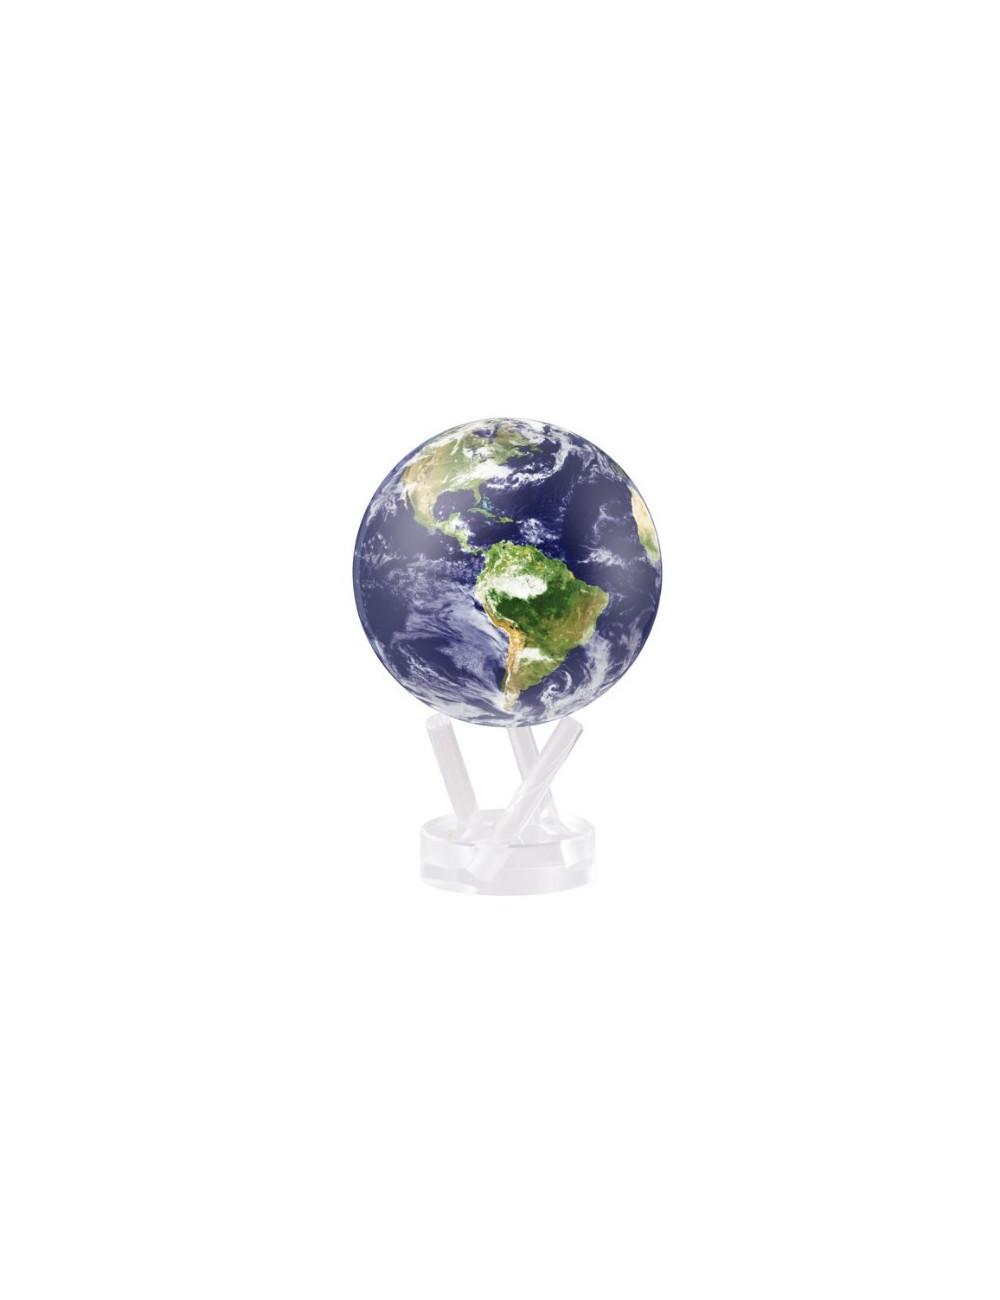 Globe MOVA autorotatif Bleu avec nuages/vue satellite 216 mm (8,5')